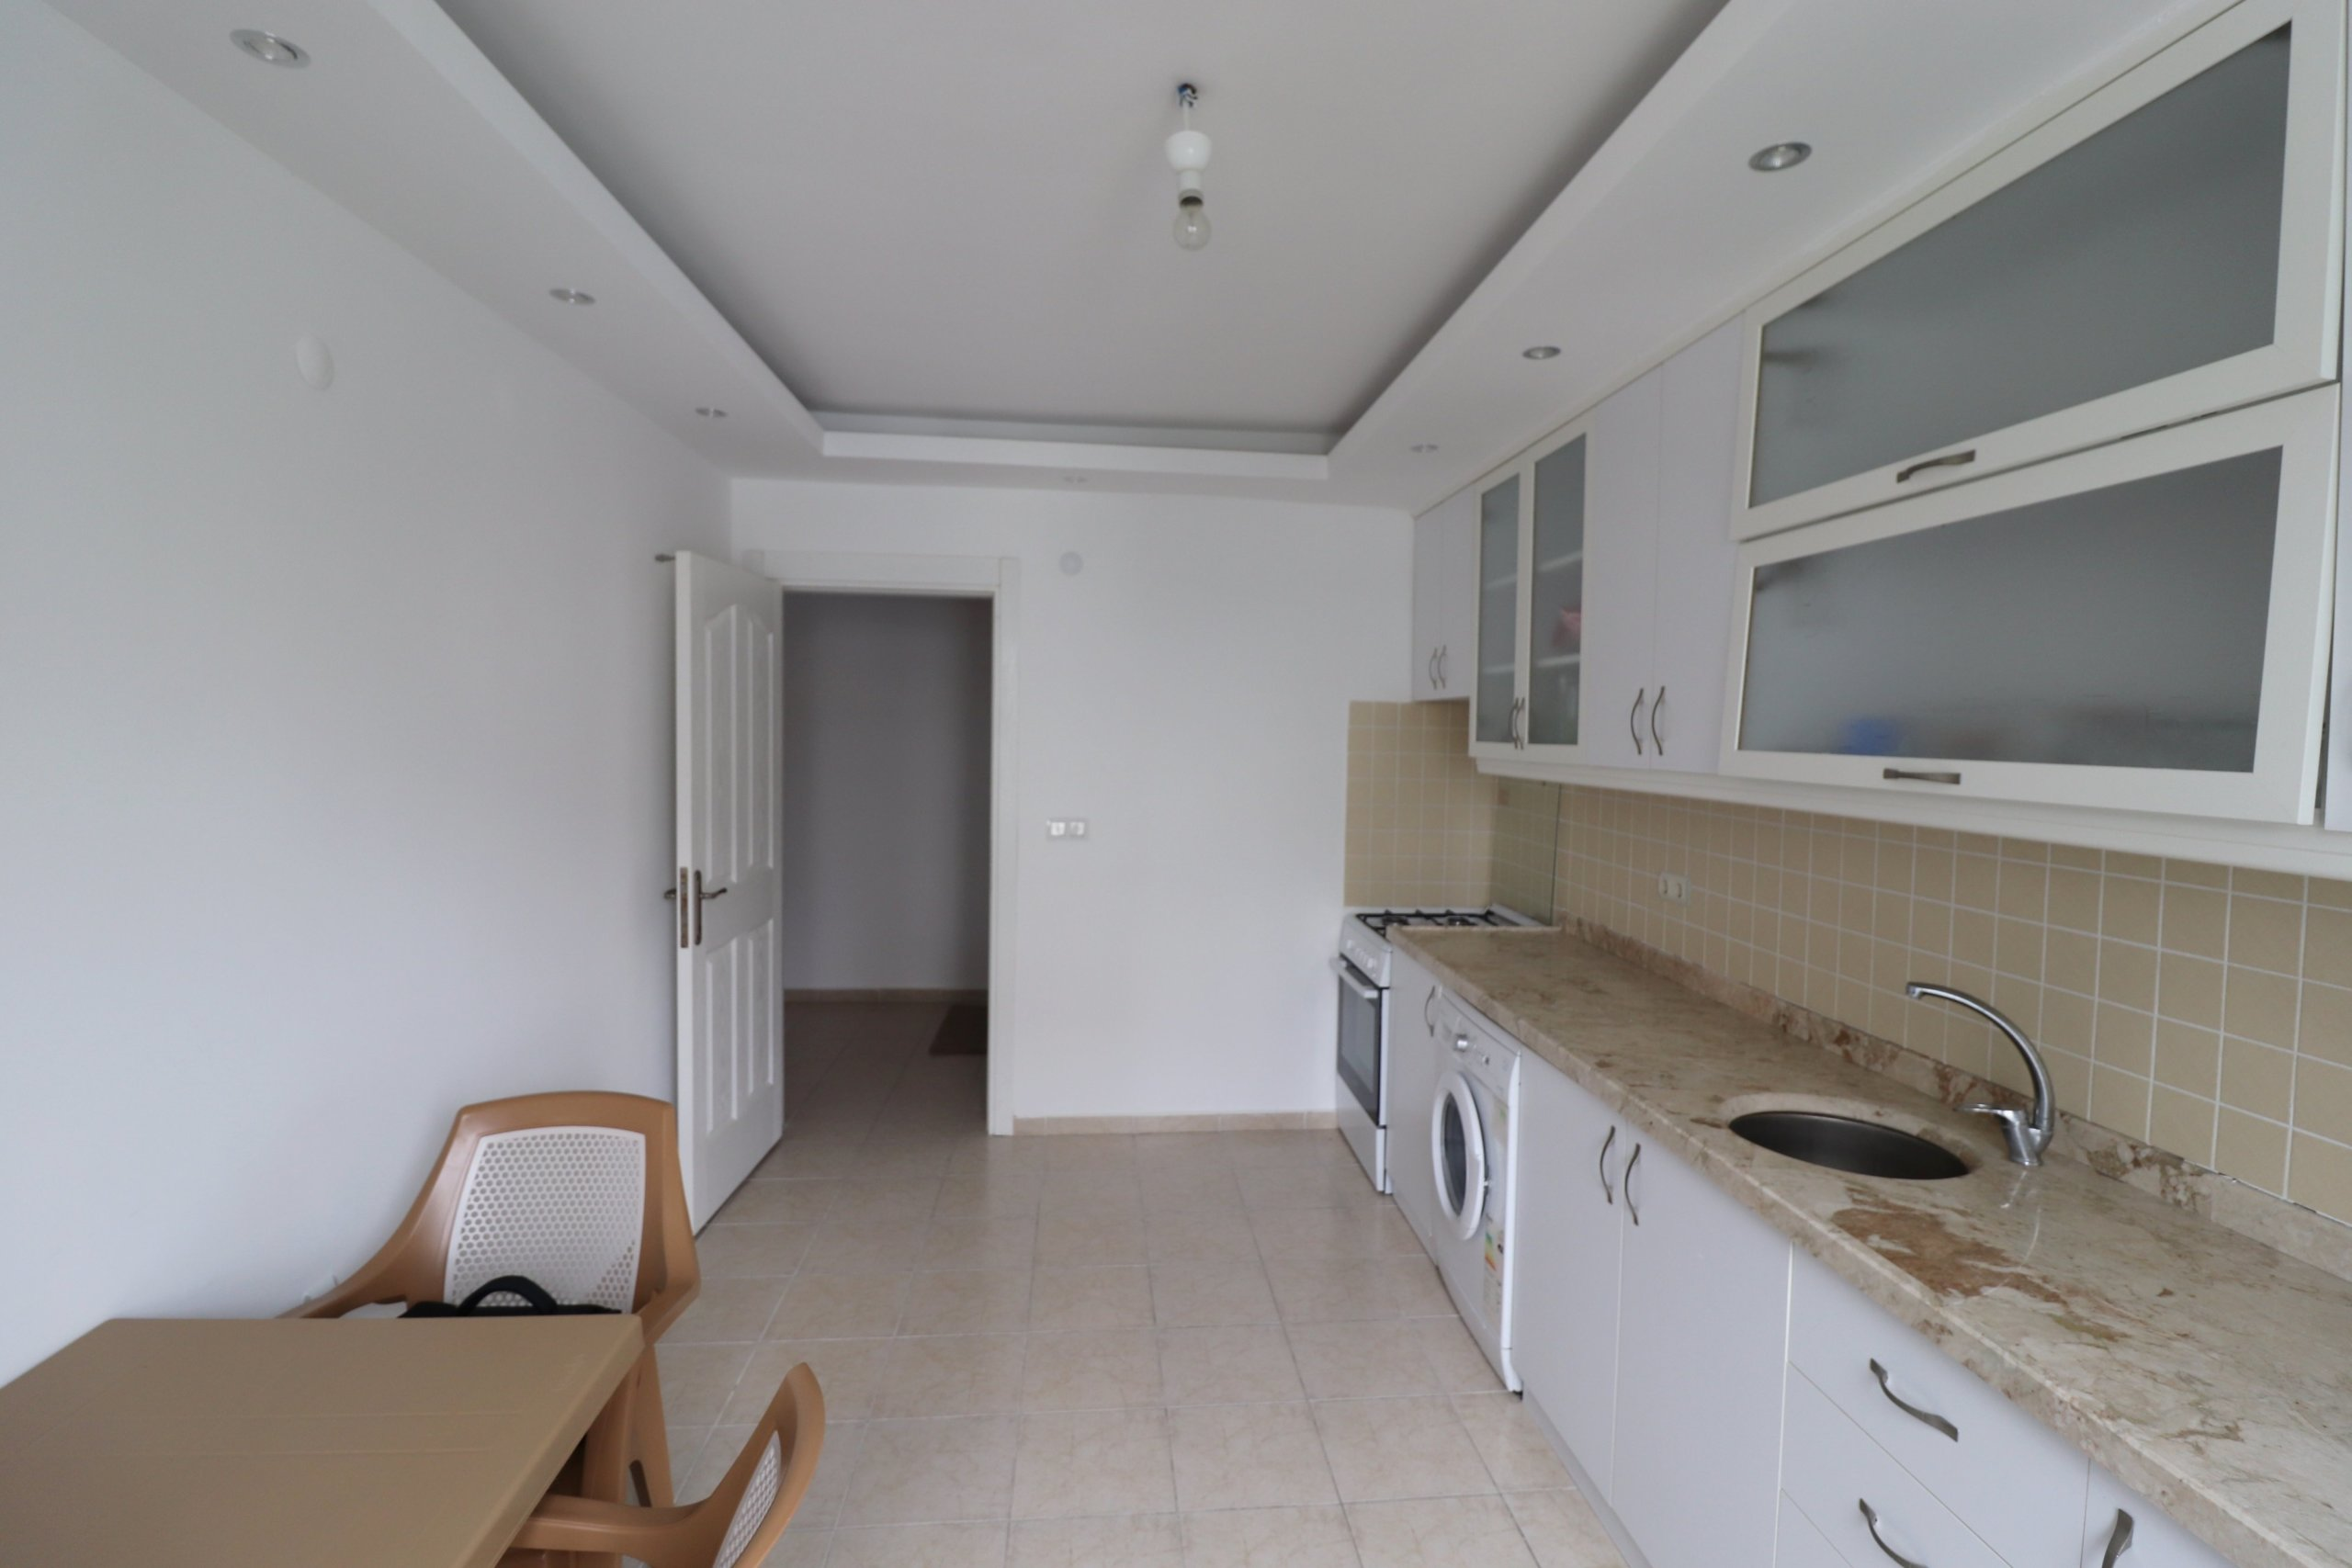 Алания Махмутлар Квартира 2+1 на Первой Линии